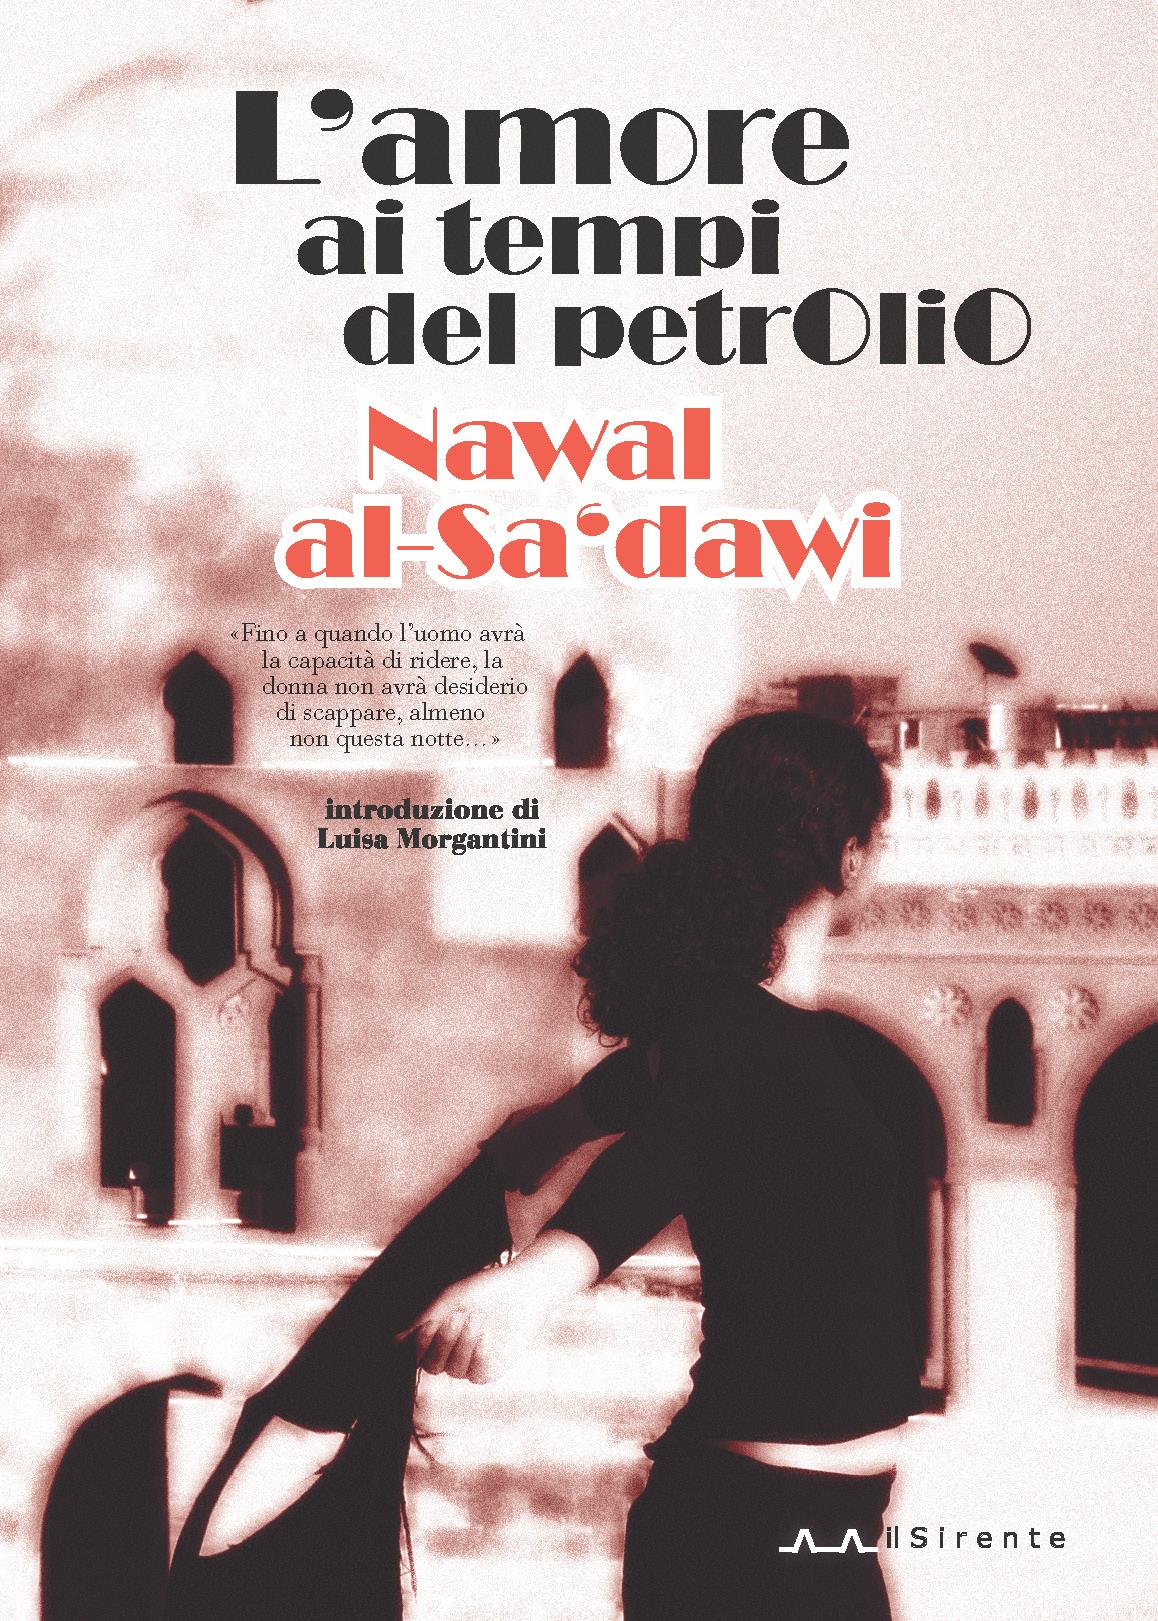 L'amore ai tempi del petrolio (Nawal al-Sa'dawi)